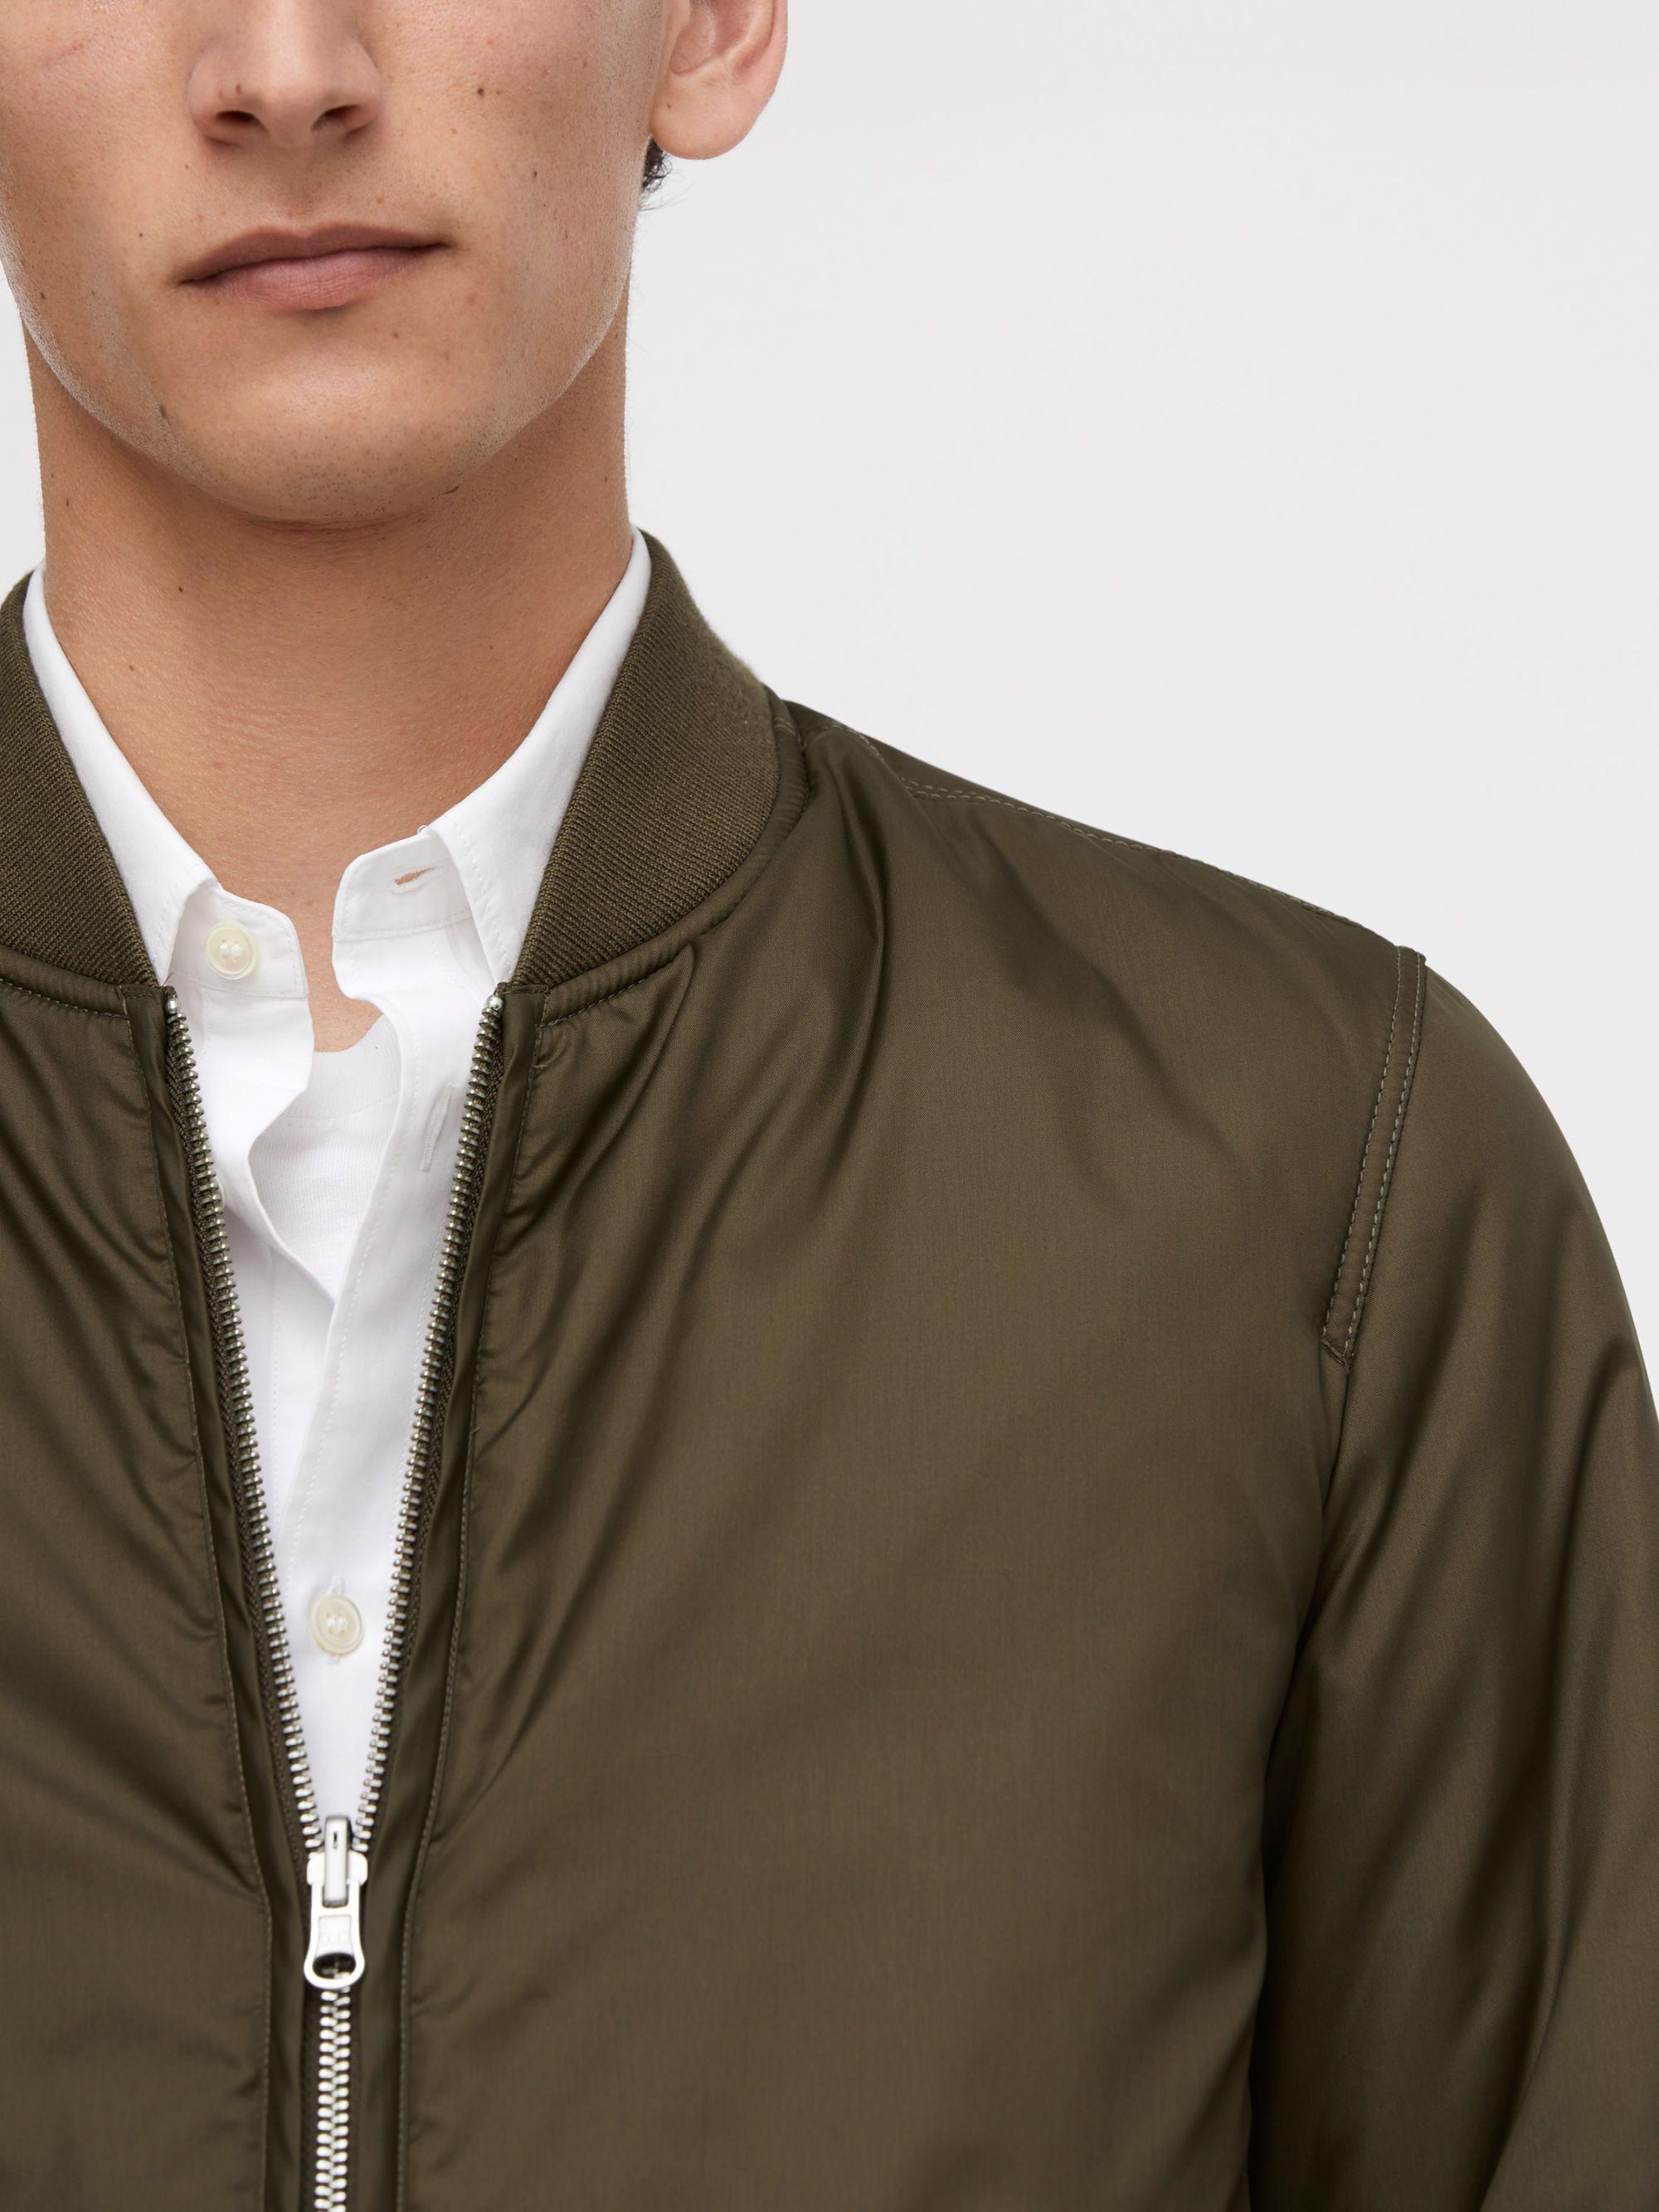 67ba29bfac 142003-470 -Nylon Liner Jacket. This jacket is part of the ARKET 2-1 ...